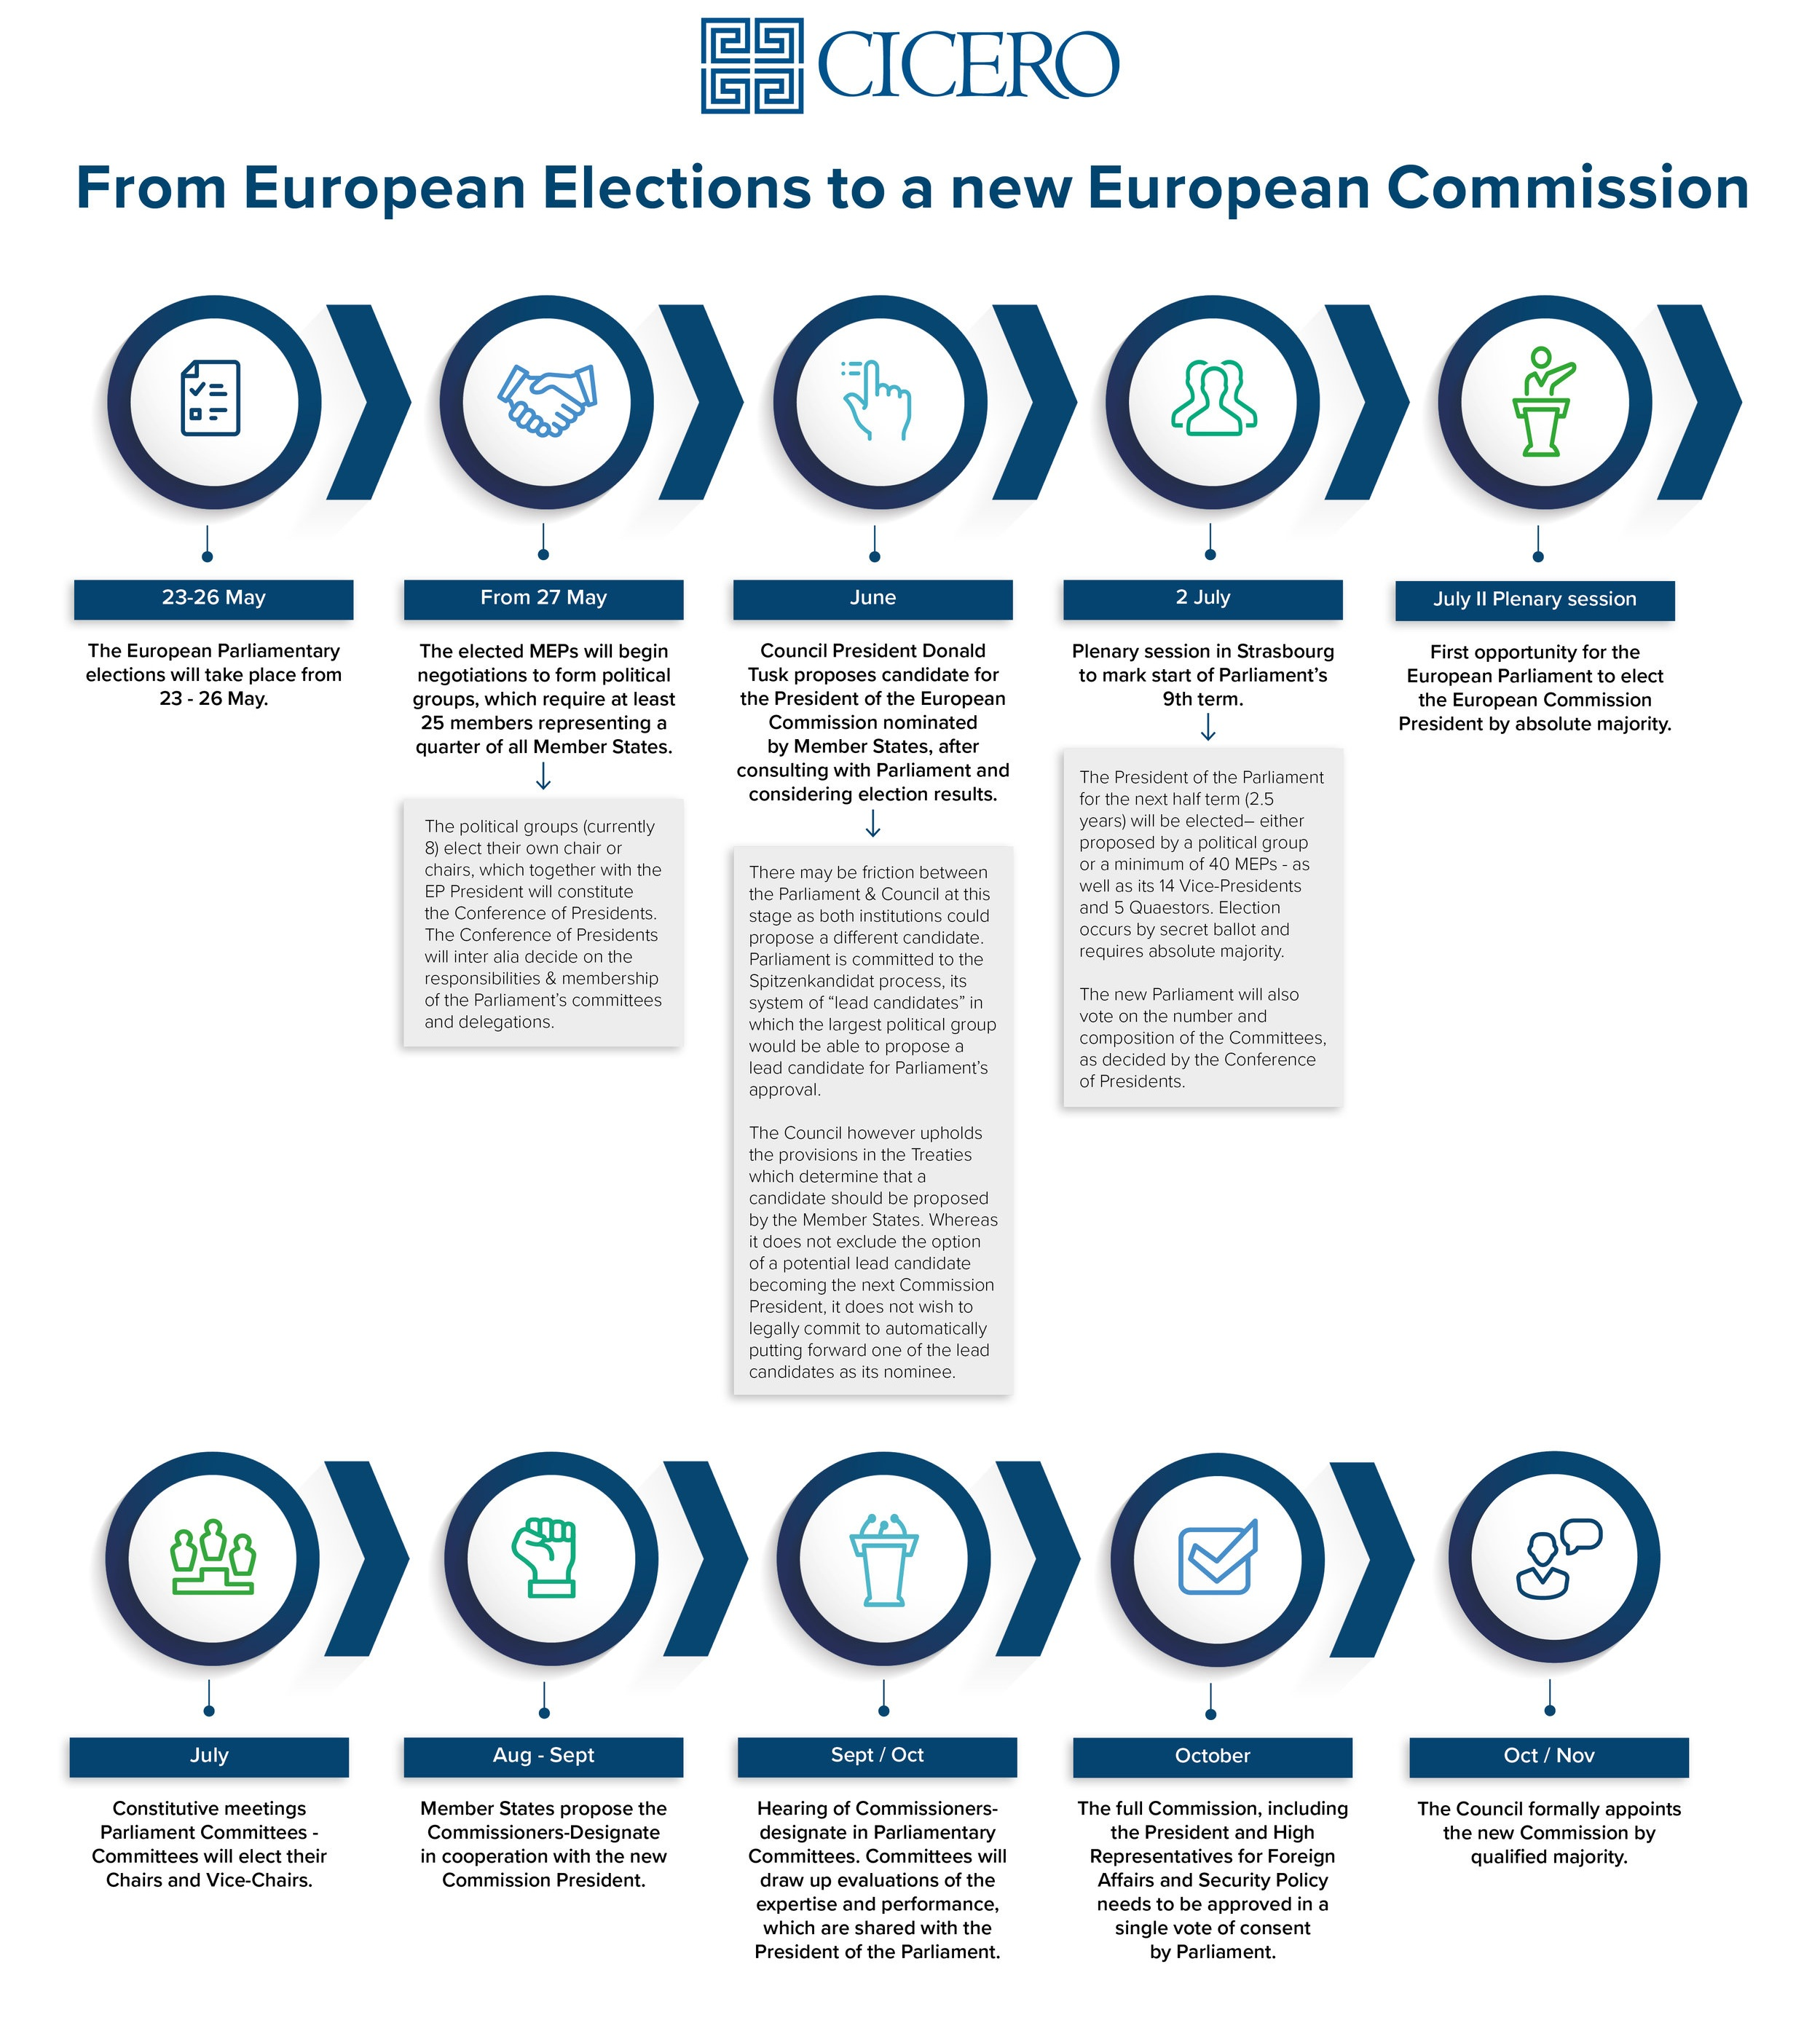 Cicero+Group+EU+formation+process.jpg